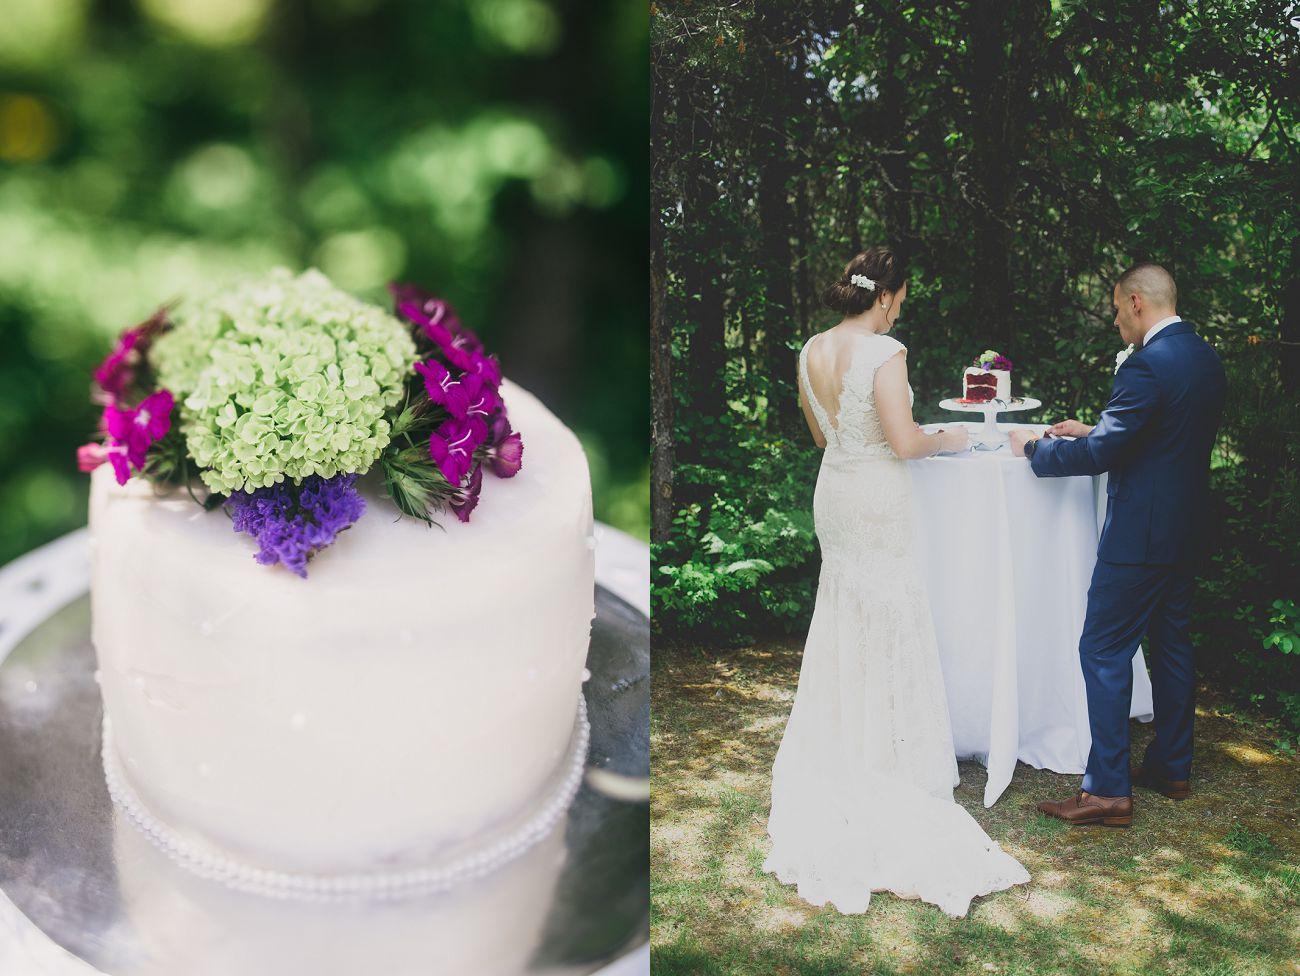 Jennifer_Mooney_Photo_Glacier_Park_Weddings_Elopement_00011.jpg